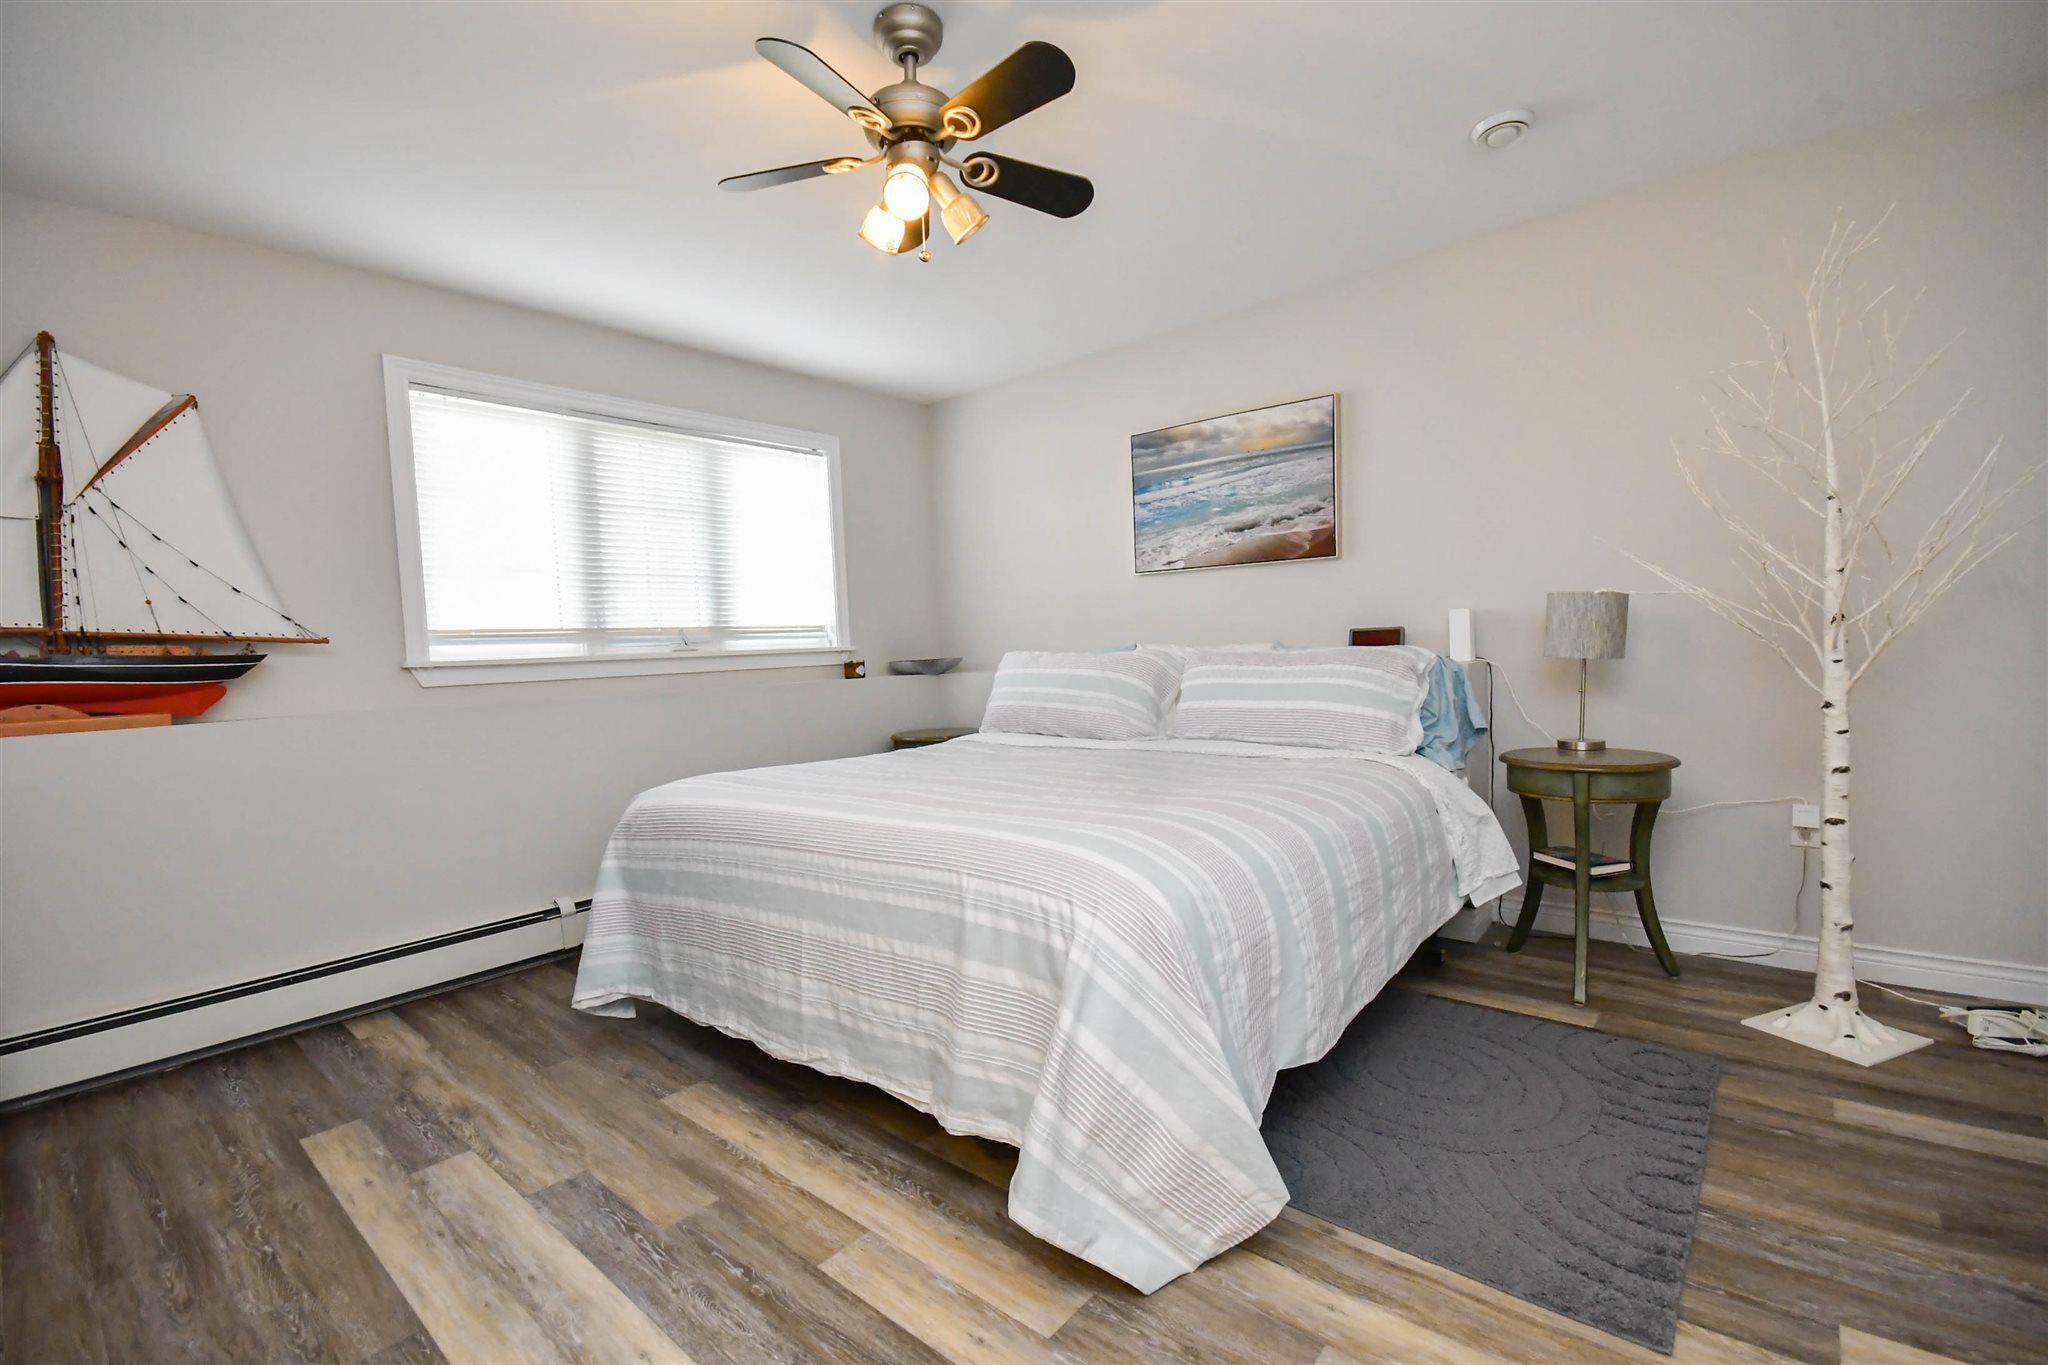 Photo 18: Photos: 17 Armstrong Court in Halifax: 5-Fairmount, Clayton Park, Rockingham Residential for sale (Halifax-Dartmouth)  : MLS®# 202105075